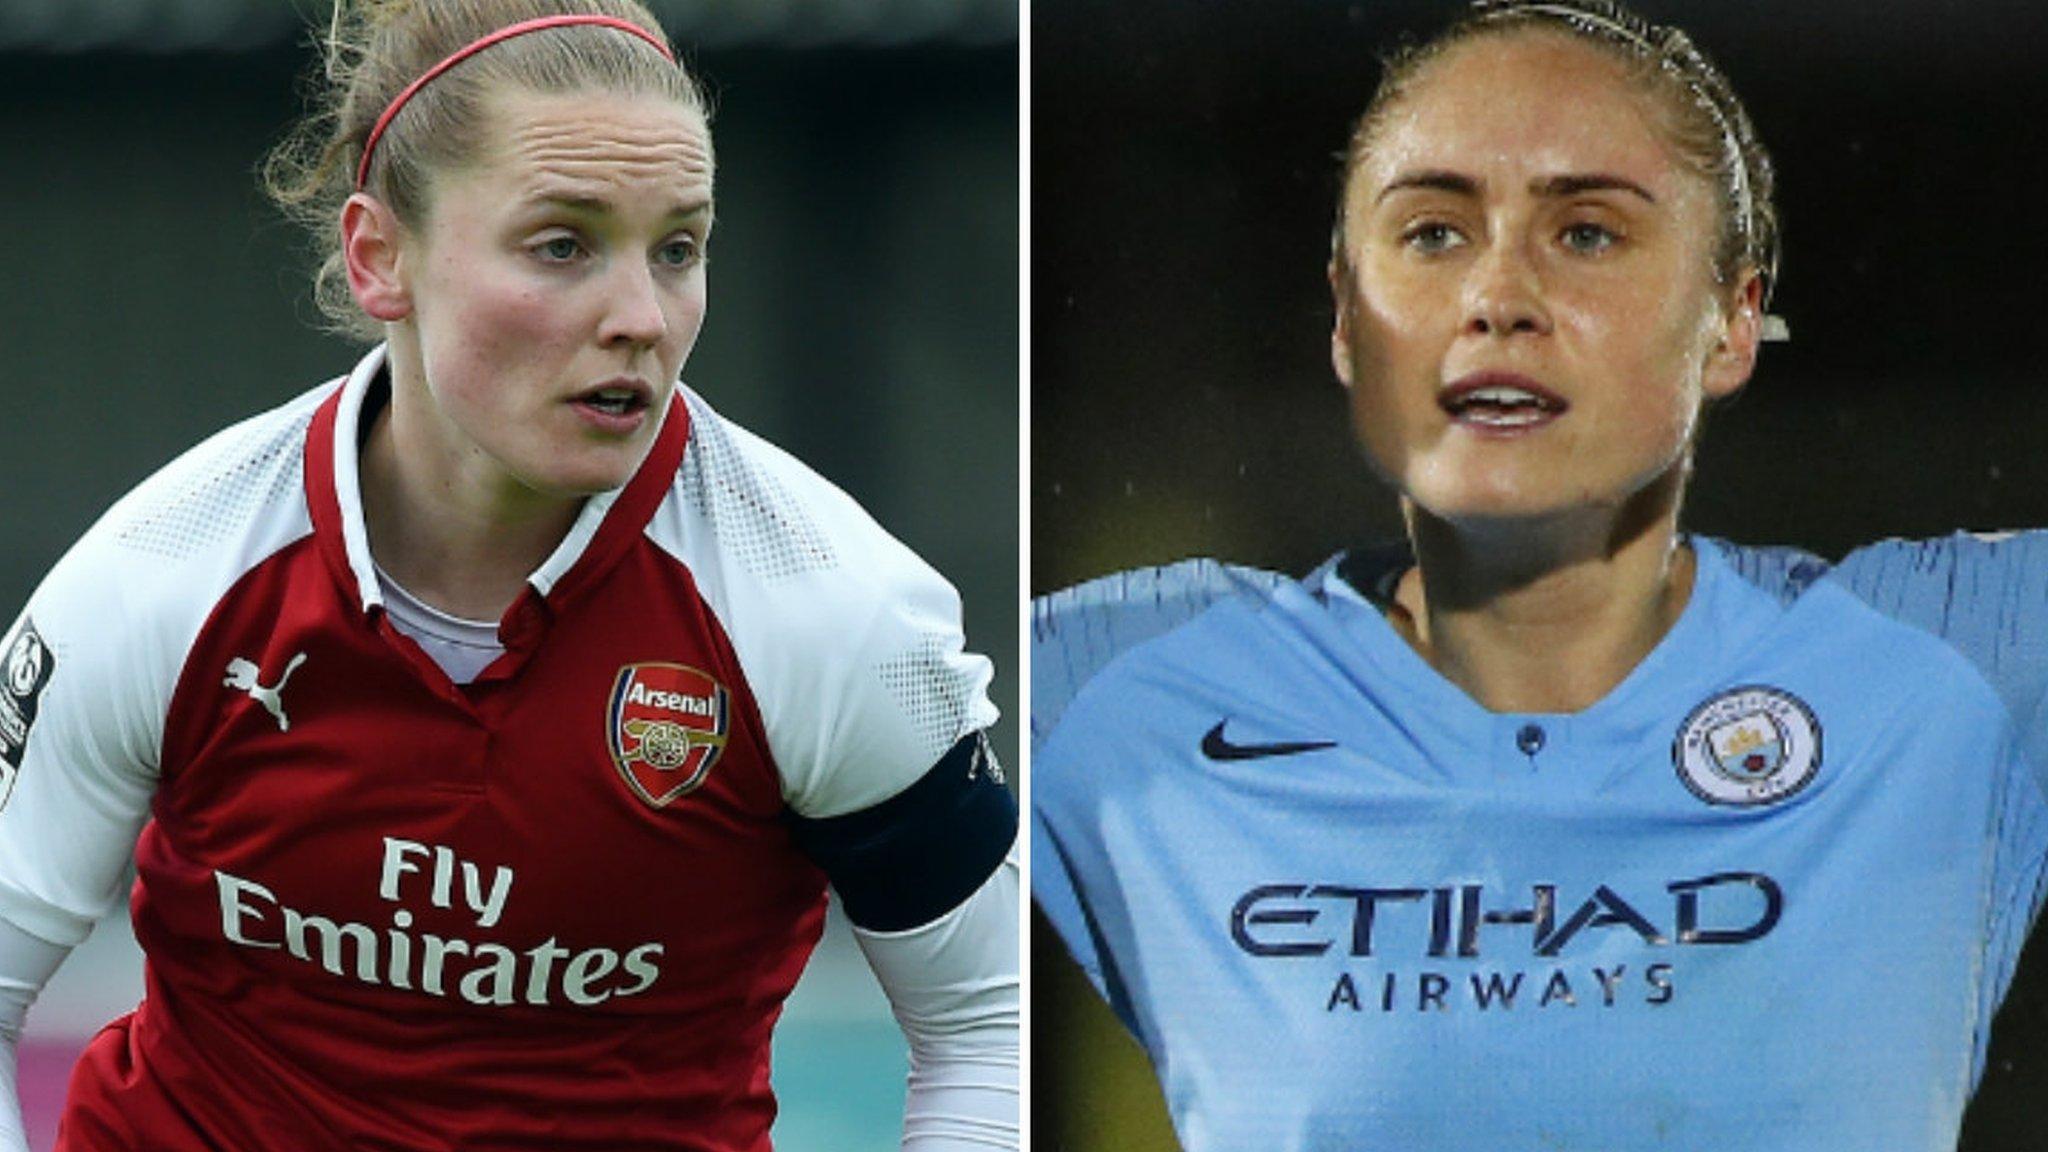 Continental Cup final: Arsenal Women v Manchester City Women | BBC